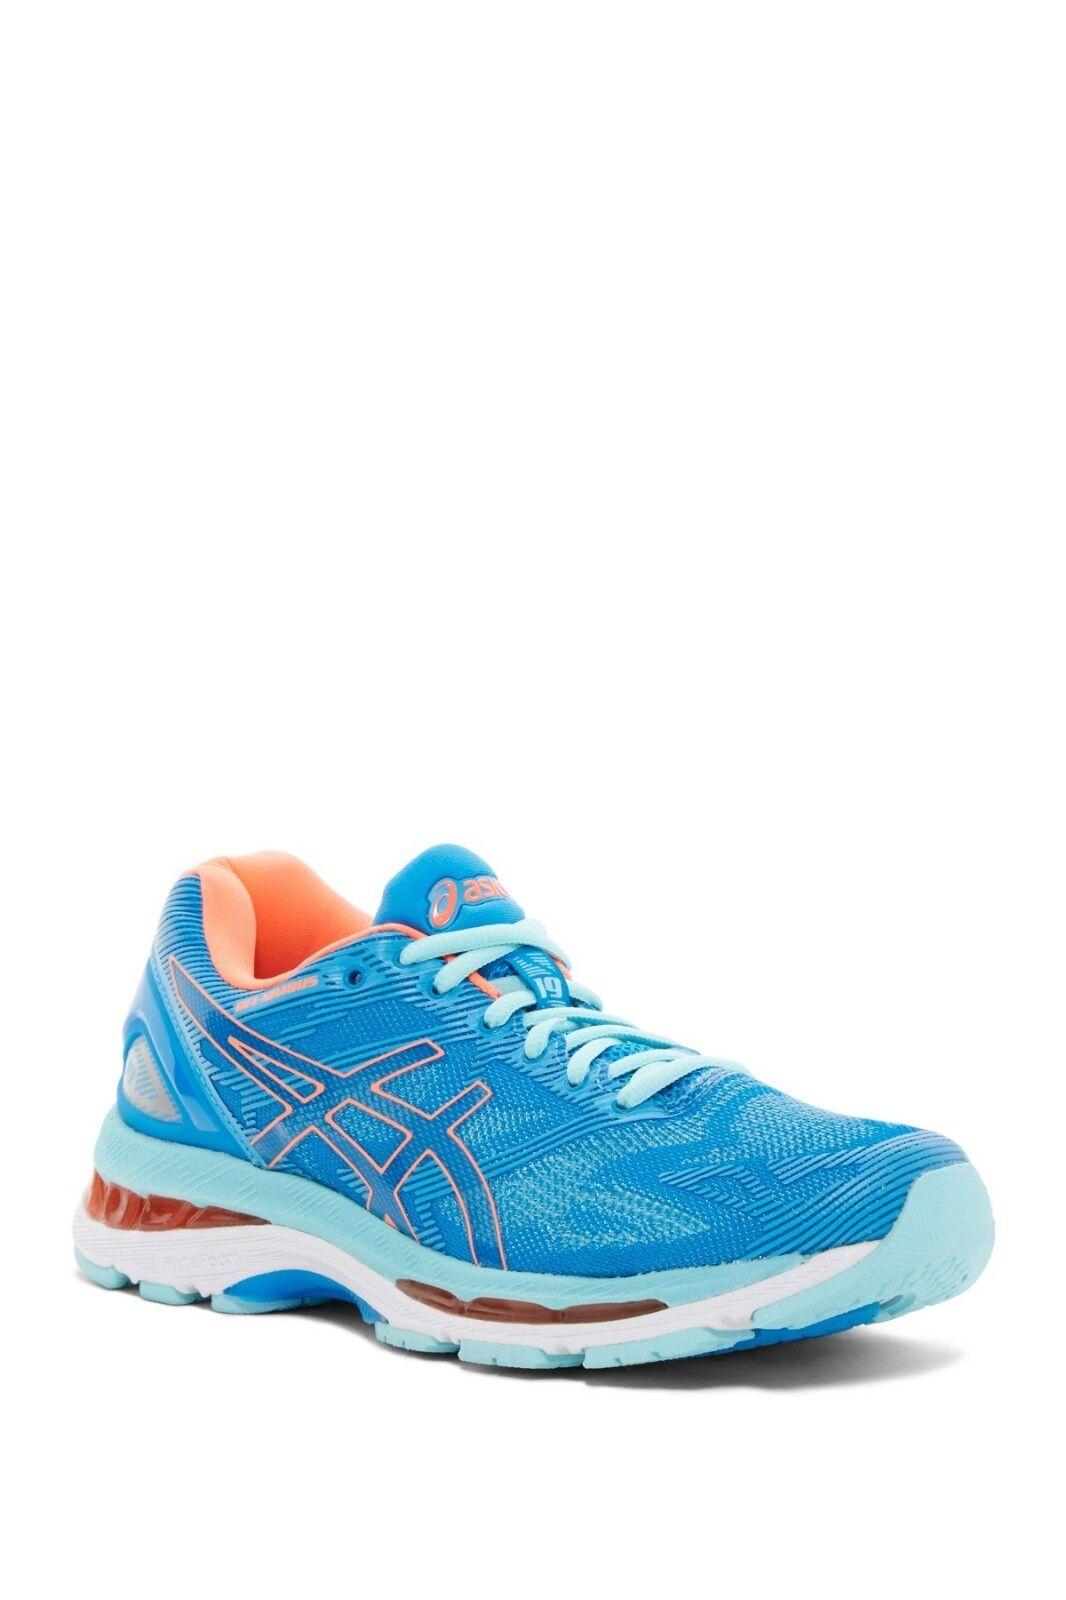 NWT ASICS GEL-Nimbus 19 Trail Running Sneaker blueE-CORAL WOMENS Sz 5 5 5 6